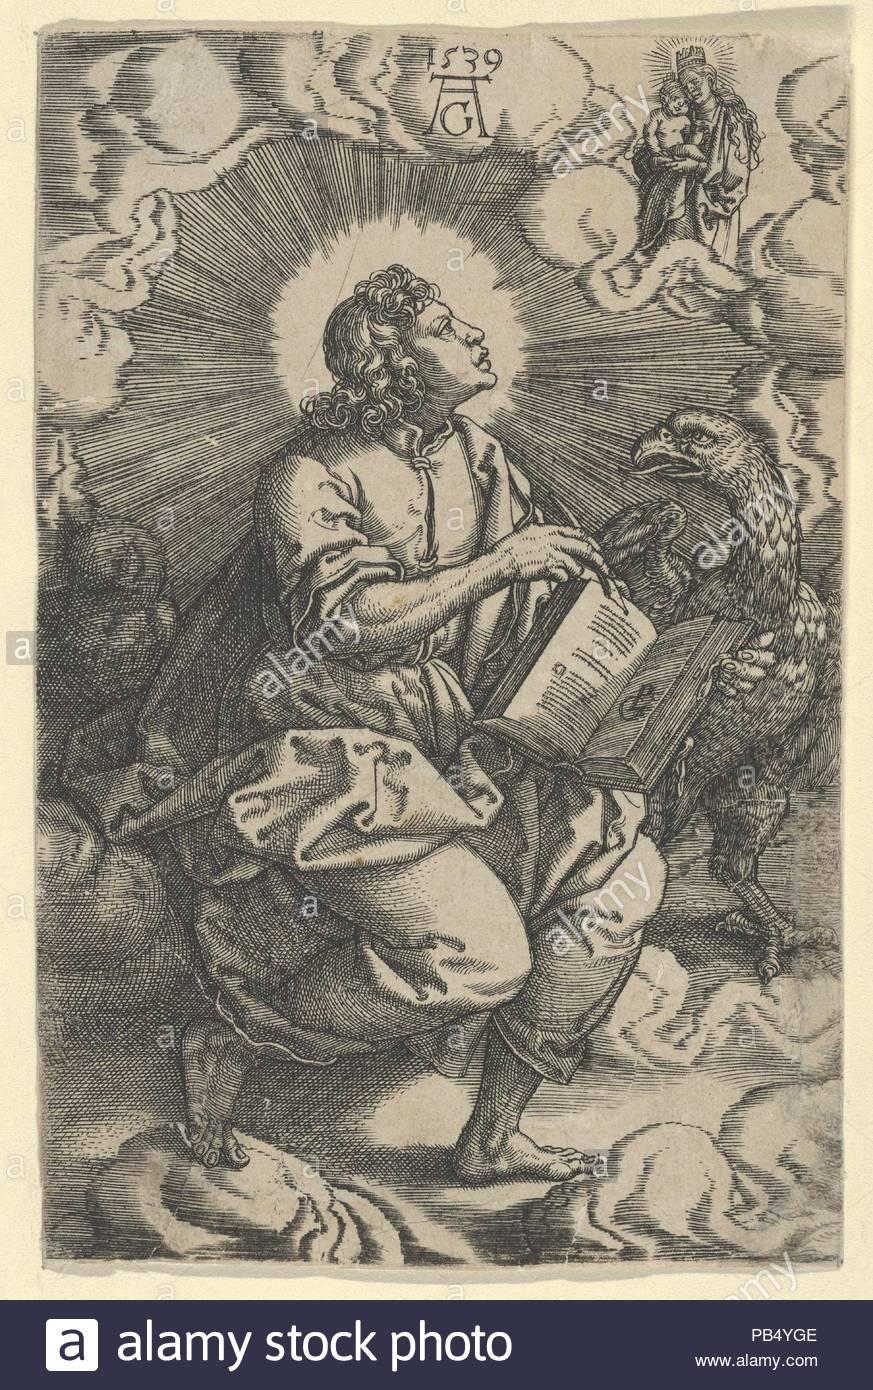 Saint John, from The Four Evangelists. Artist: Heinrich Aldegrever (German, Paderborn ca. 1502-1555/1561 Soest); after Georg Pencz (German, Wroclaw ca. 1500-1550 Leipzig). Dimensions: Sheet: 4 11/16 × 3 1/16 in. (11.9 × 7.8 cm). Date: 1539. Museum: Metropolitan Museum of Art, New York, USA. - Stock Image